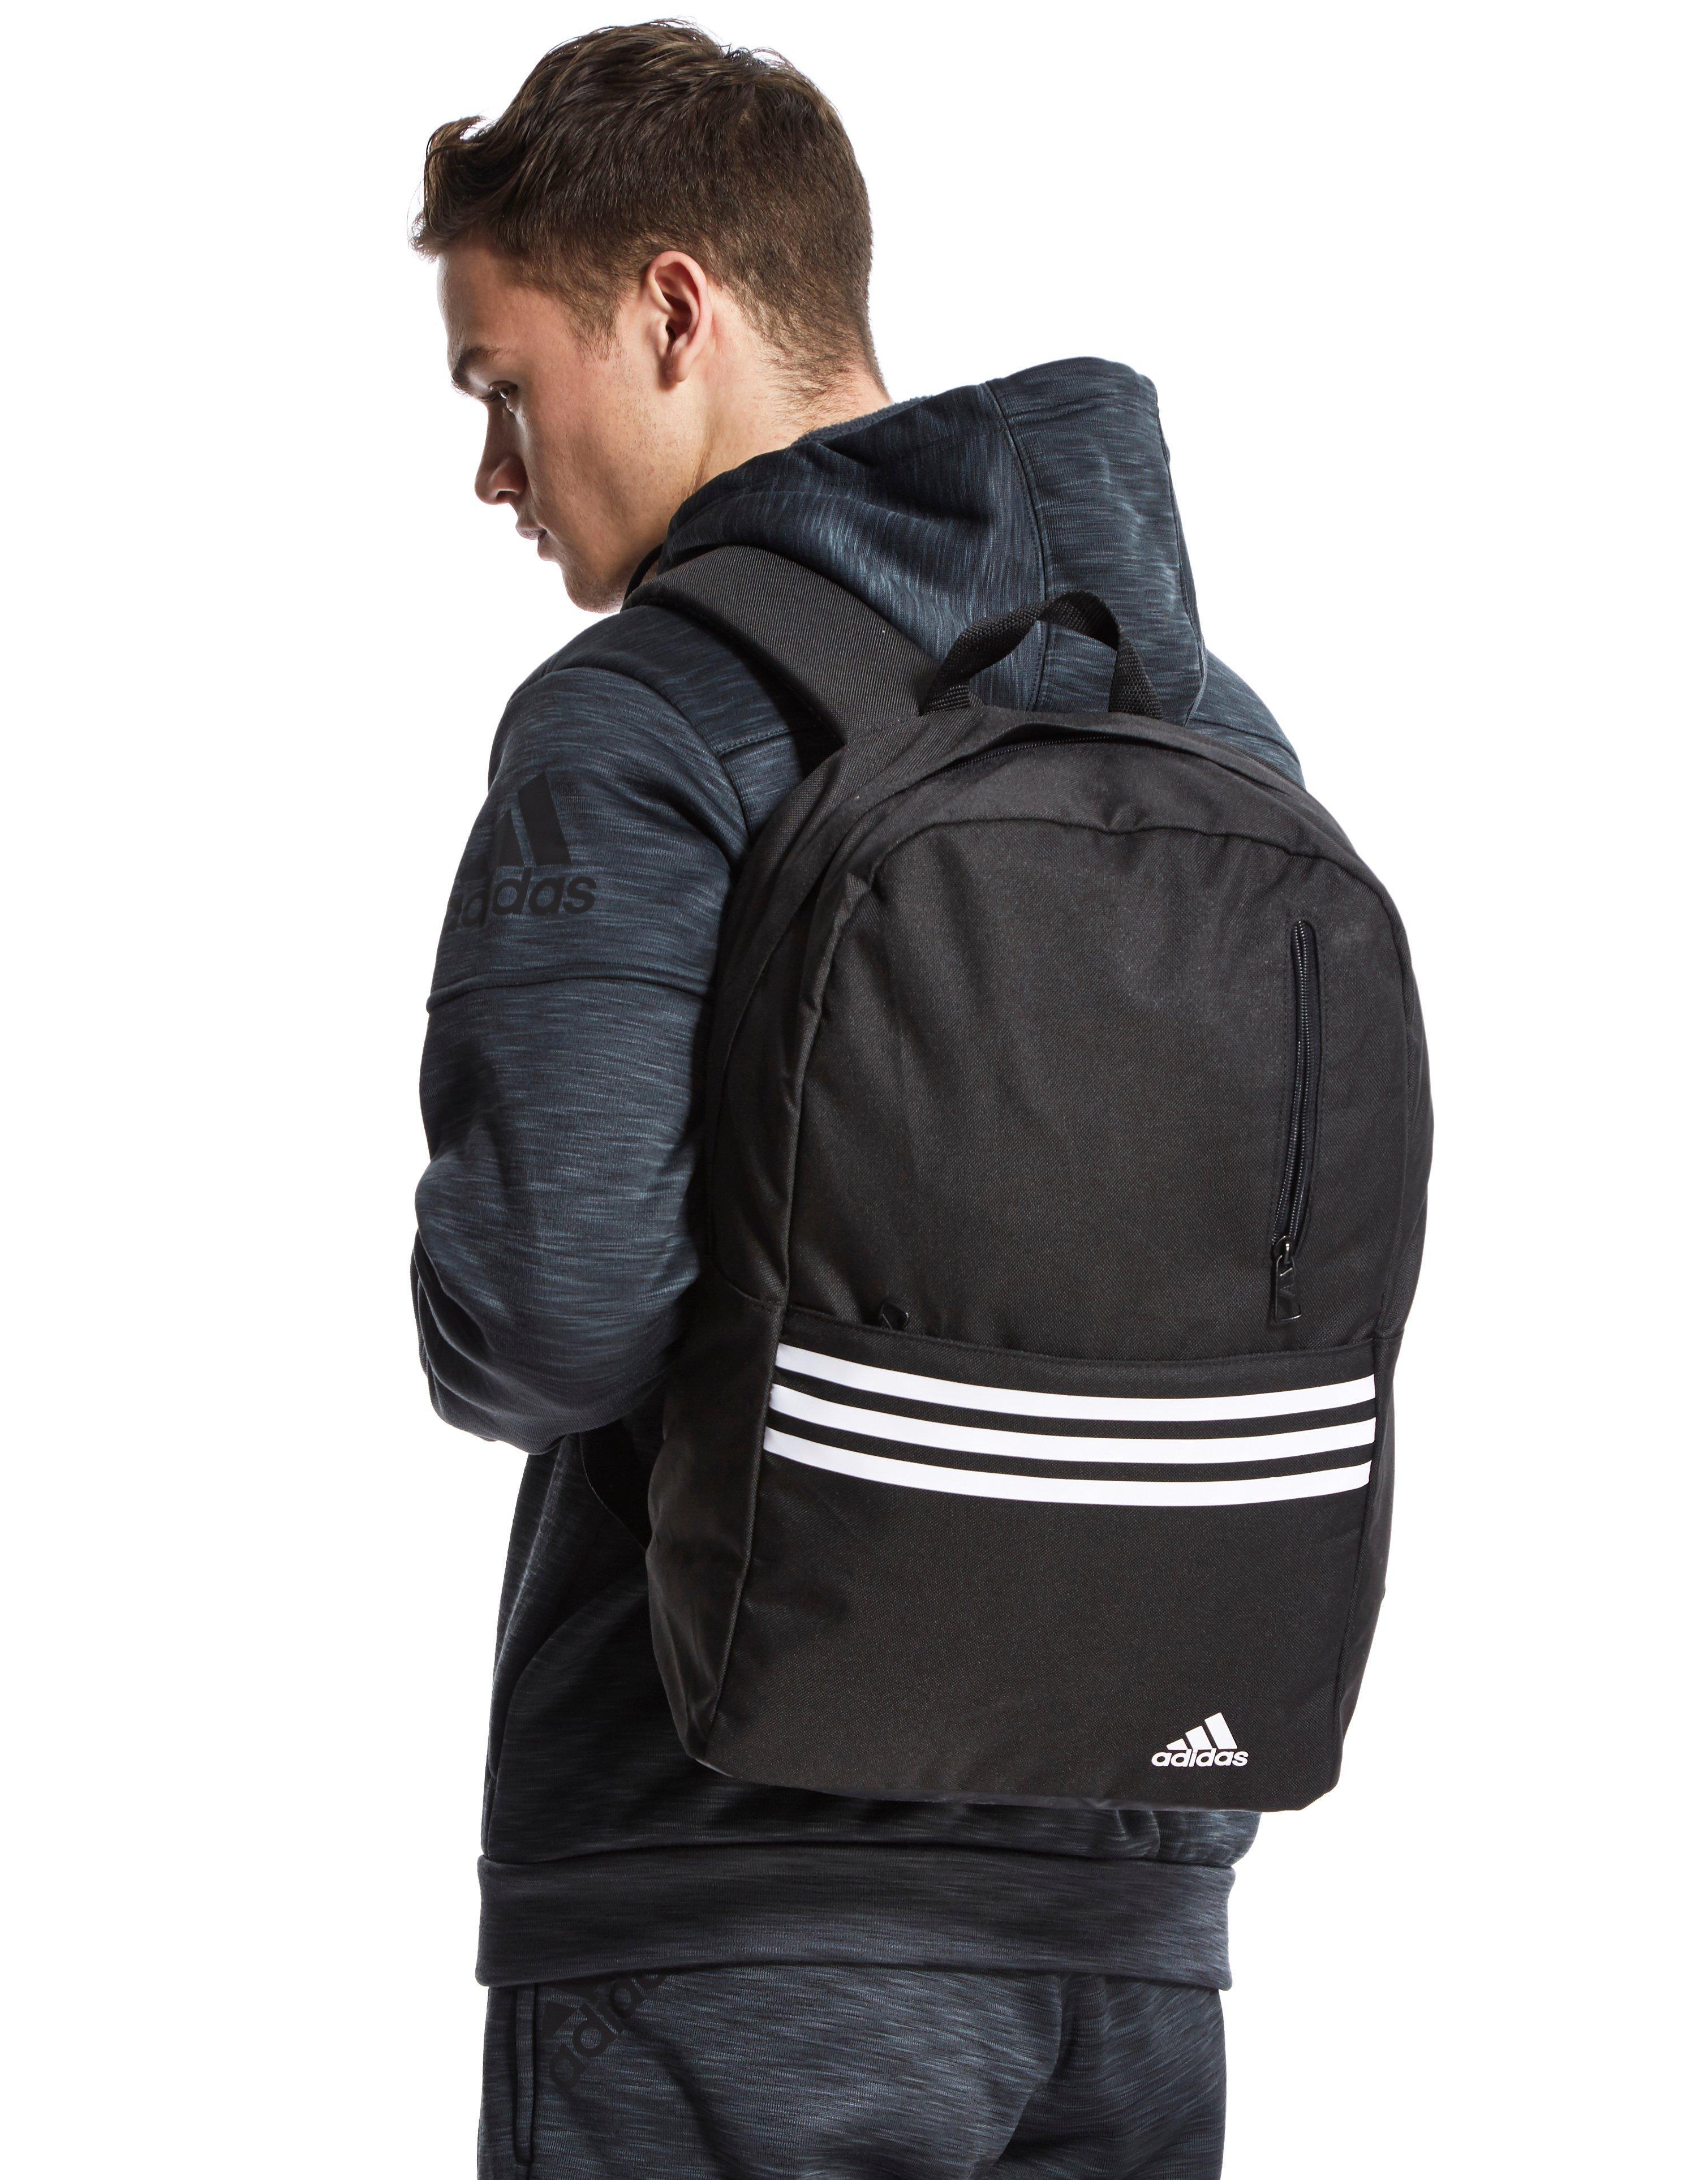 fa294928f5 adidas Originals Versatile 3-stripes Backpack in Black for Men - Lyst